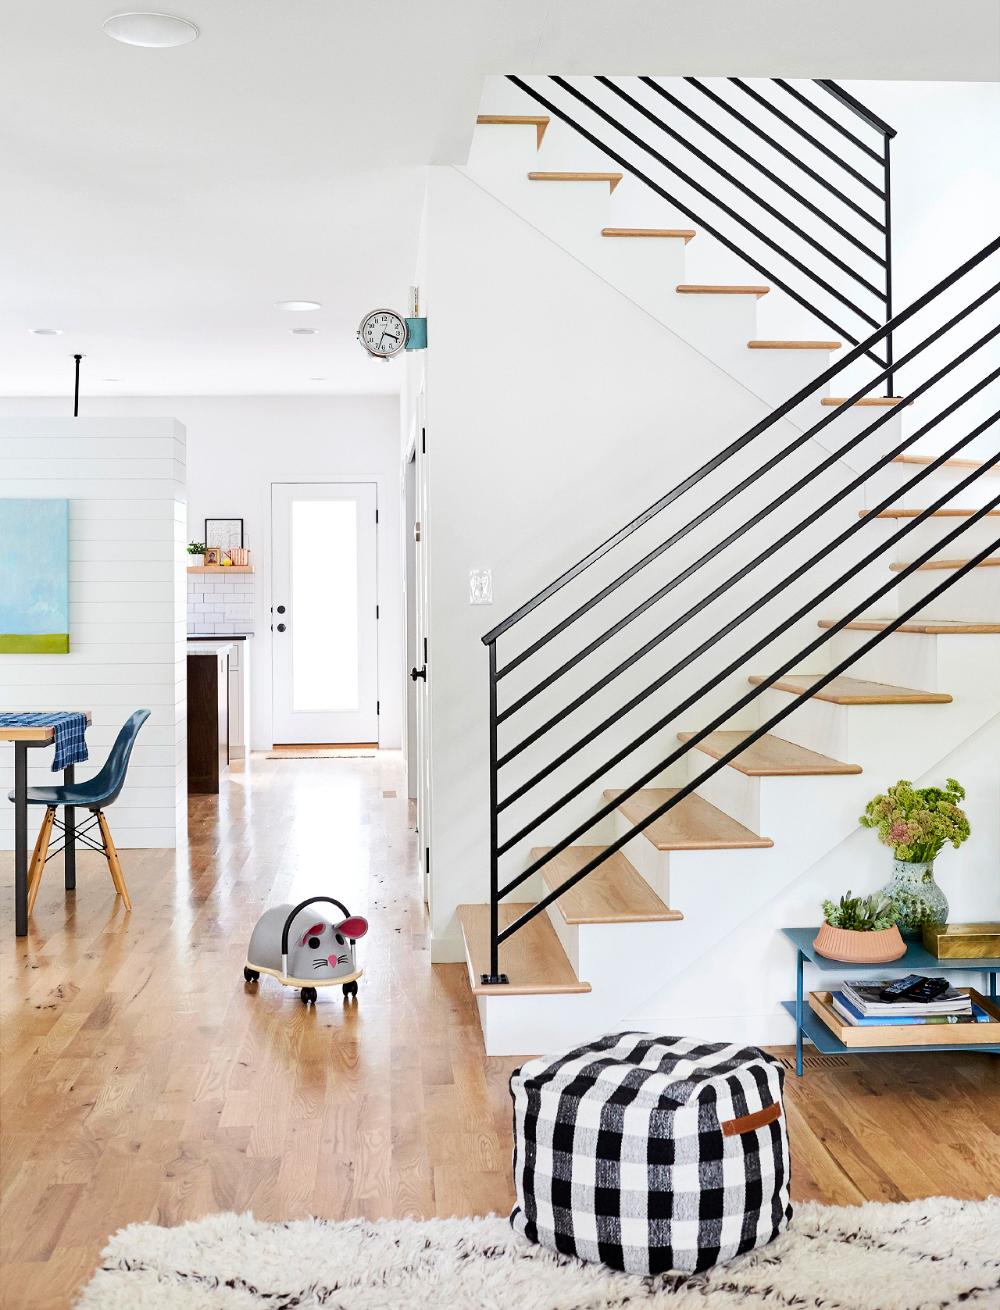 Modern Wooden Door With Ladder Style Handle Google Search | Modern House Ladder Design | Inside Outside | Metal Balustrade | Loft | Outdoor Balcony | Beautiful